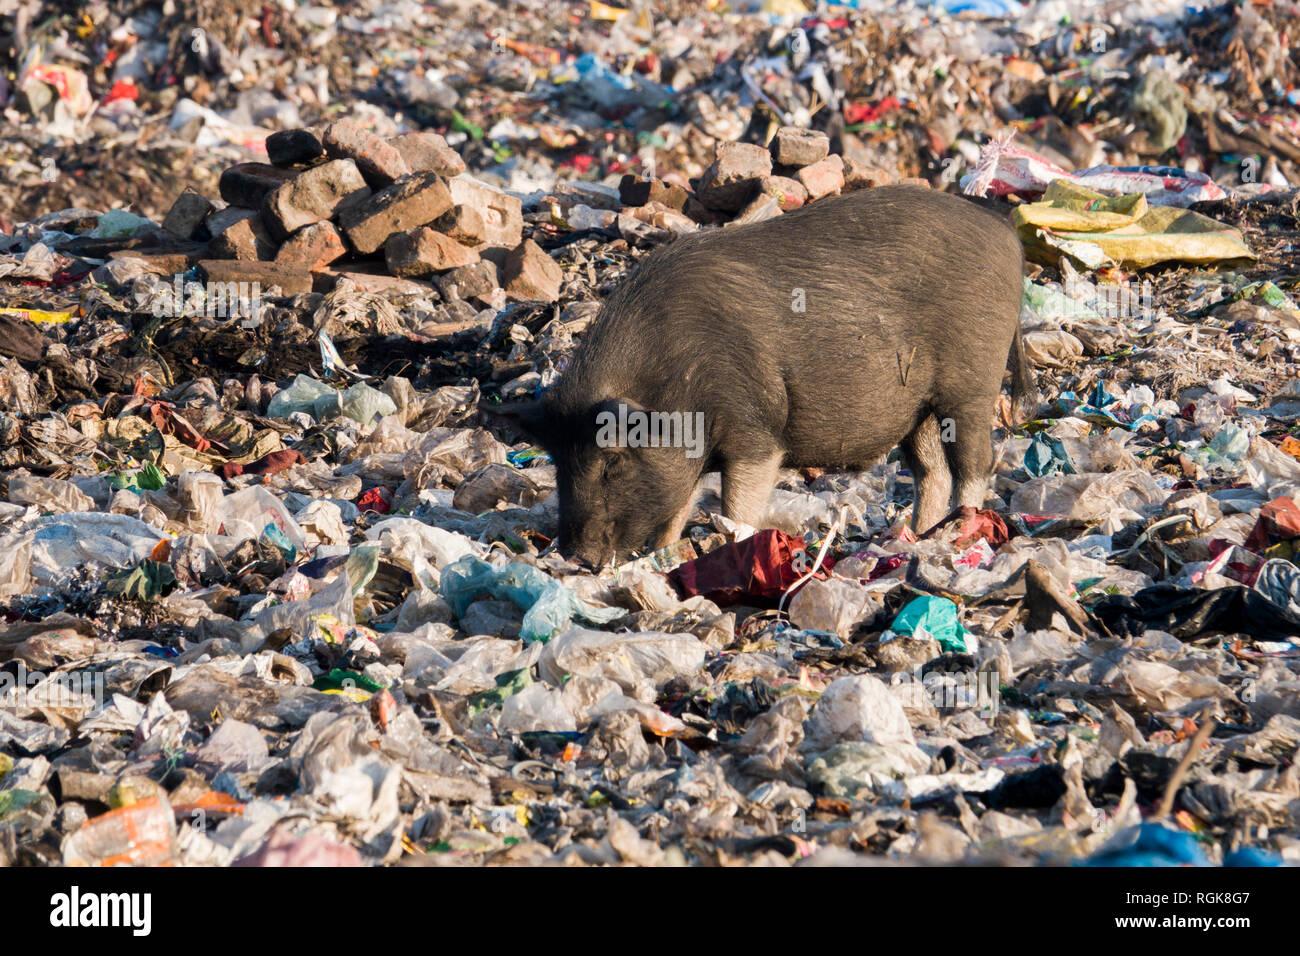 Pig scavenging through trash at dumping ground in Rishikesh, Uttarakhand, India - Stock Image